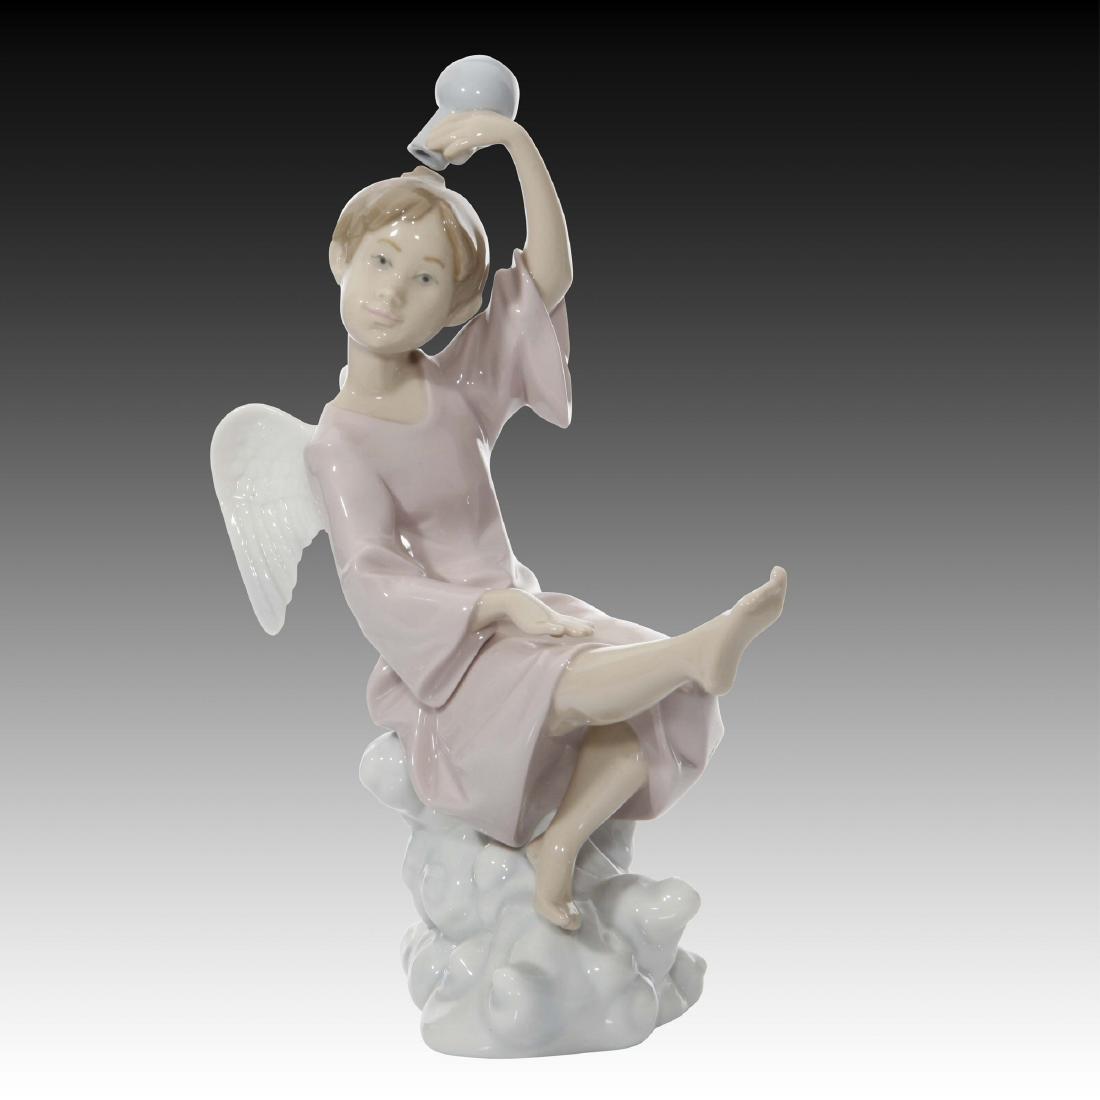 Lladro Summer Angel Figurine 6148 Retired 1997